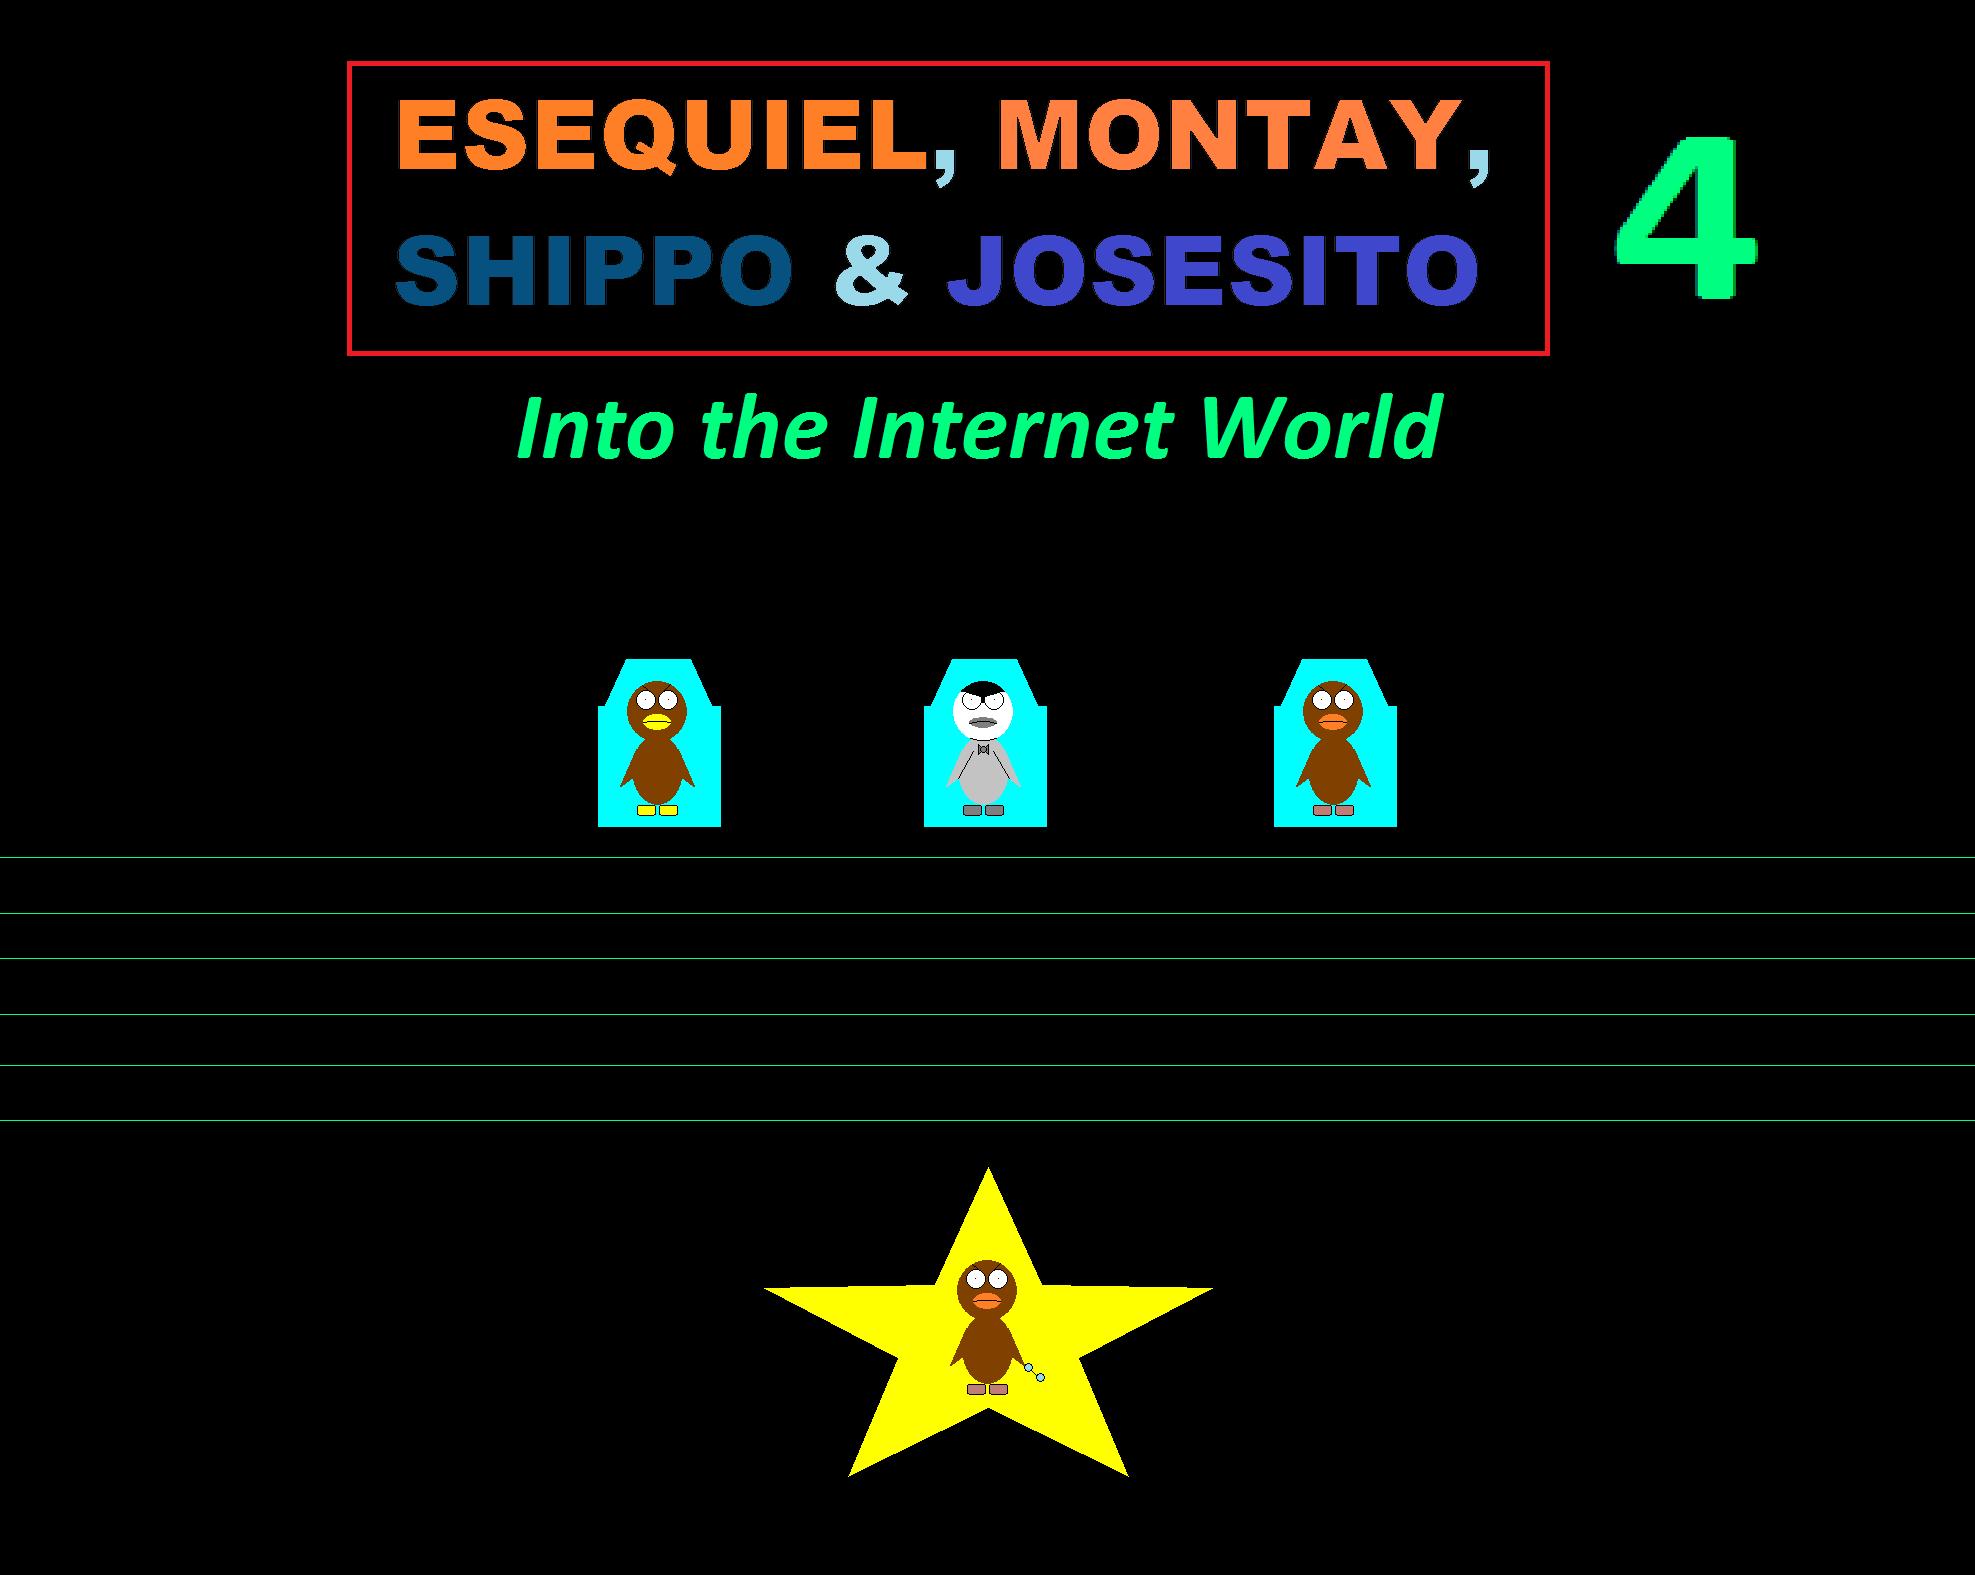 EMSJ4ITIW title by SuperMarioFan65